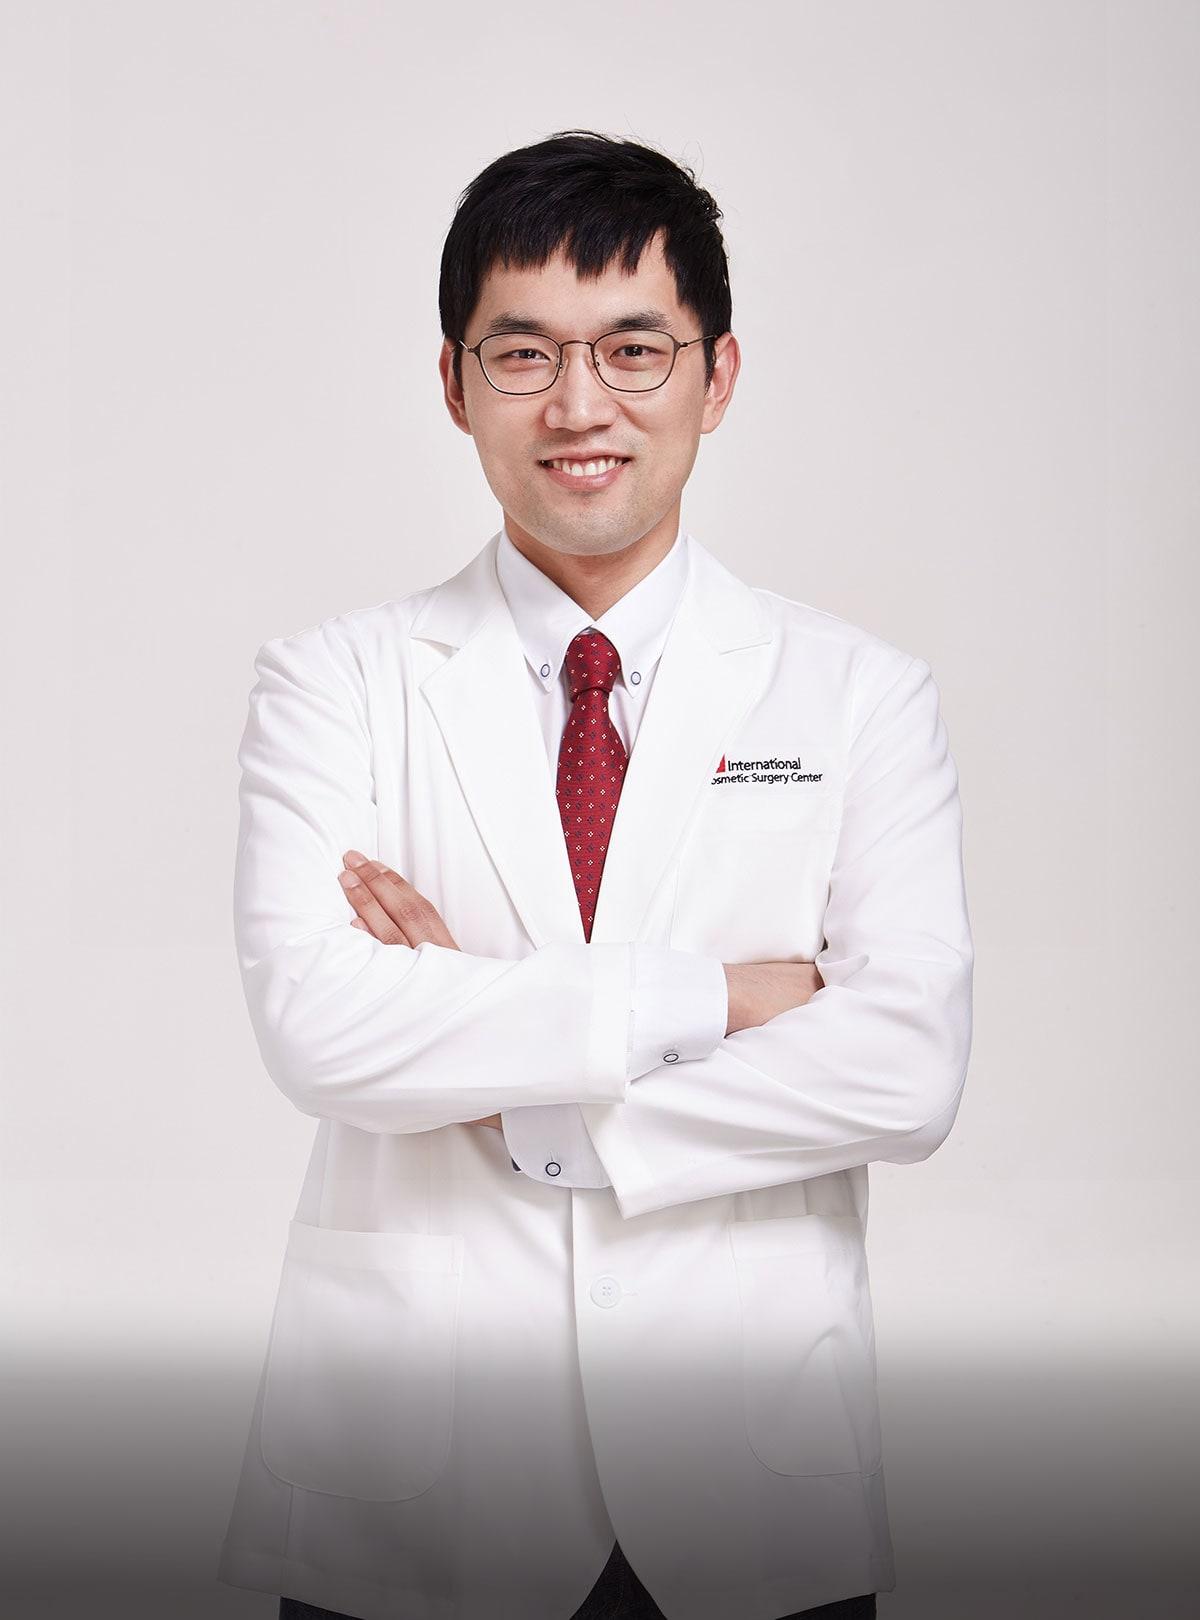 Dr. Cheol Woo Park MD. Ph.D.